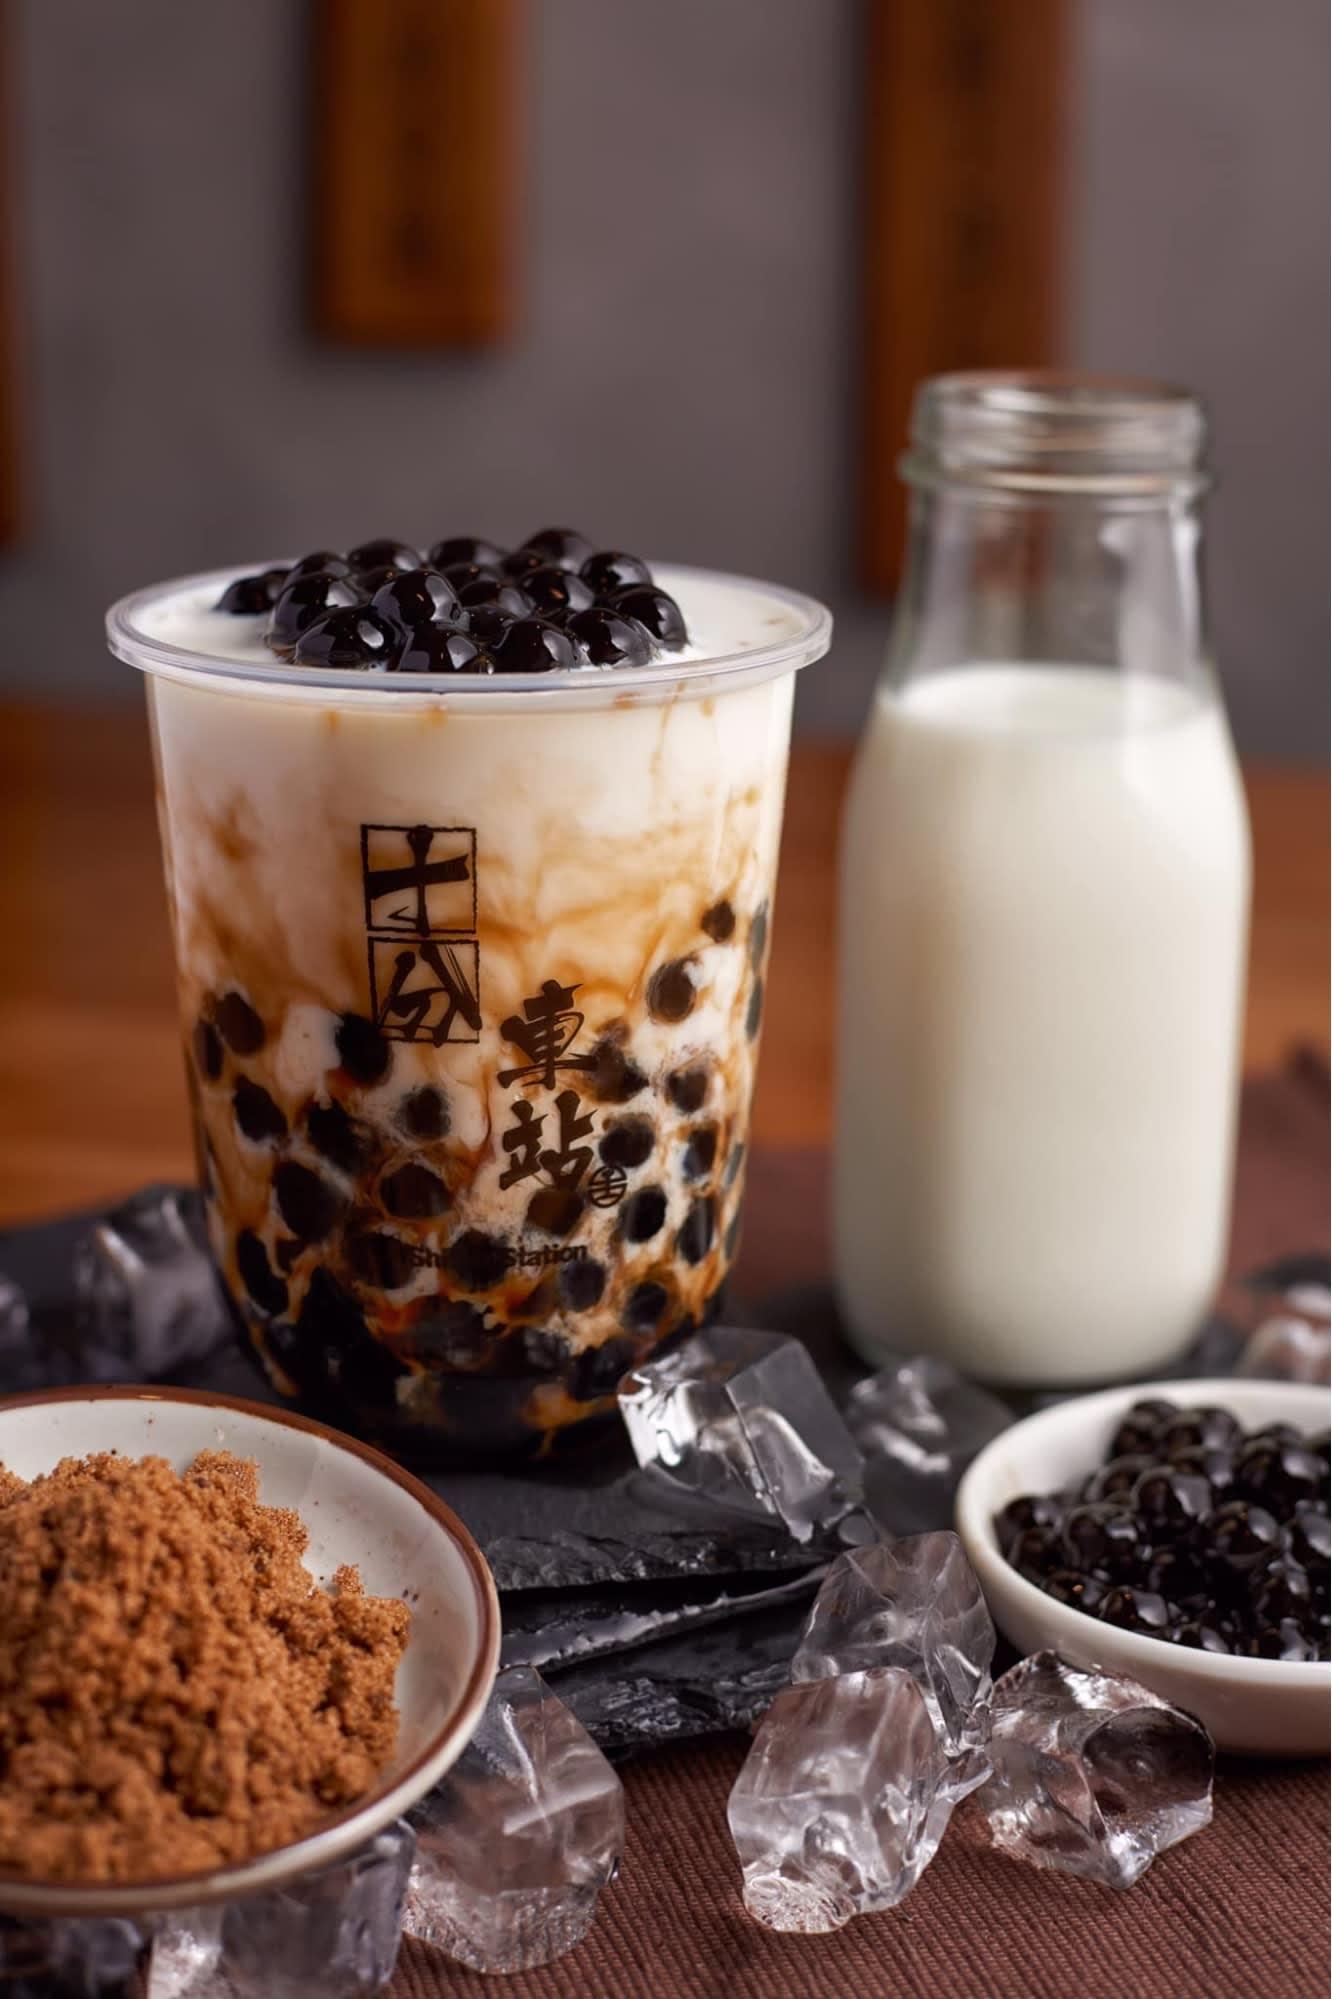 shifen station signature marblearl milk tea